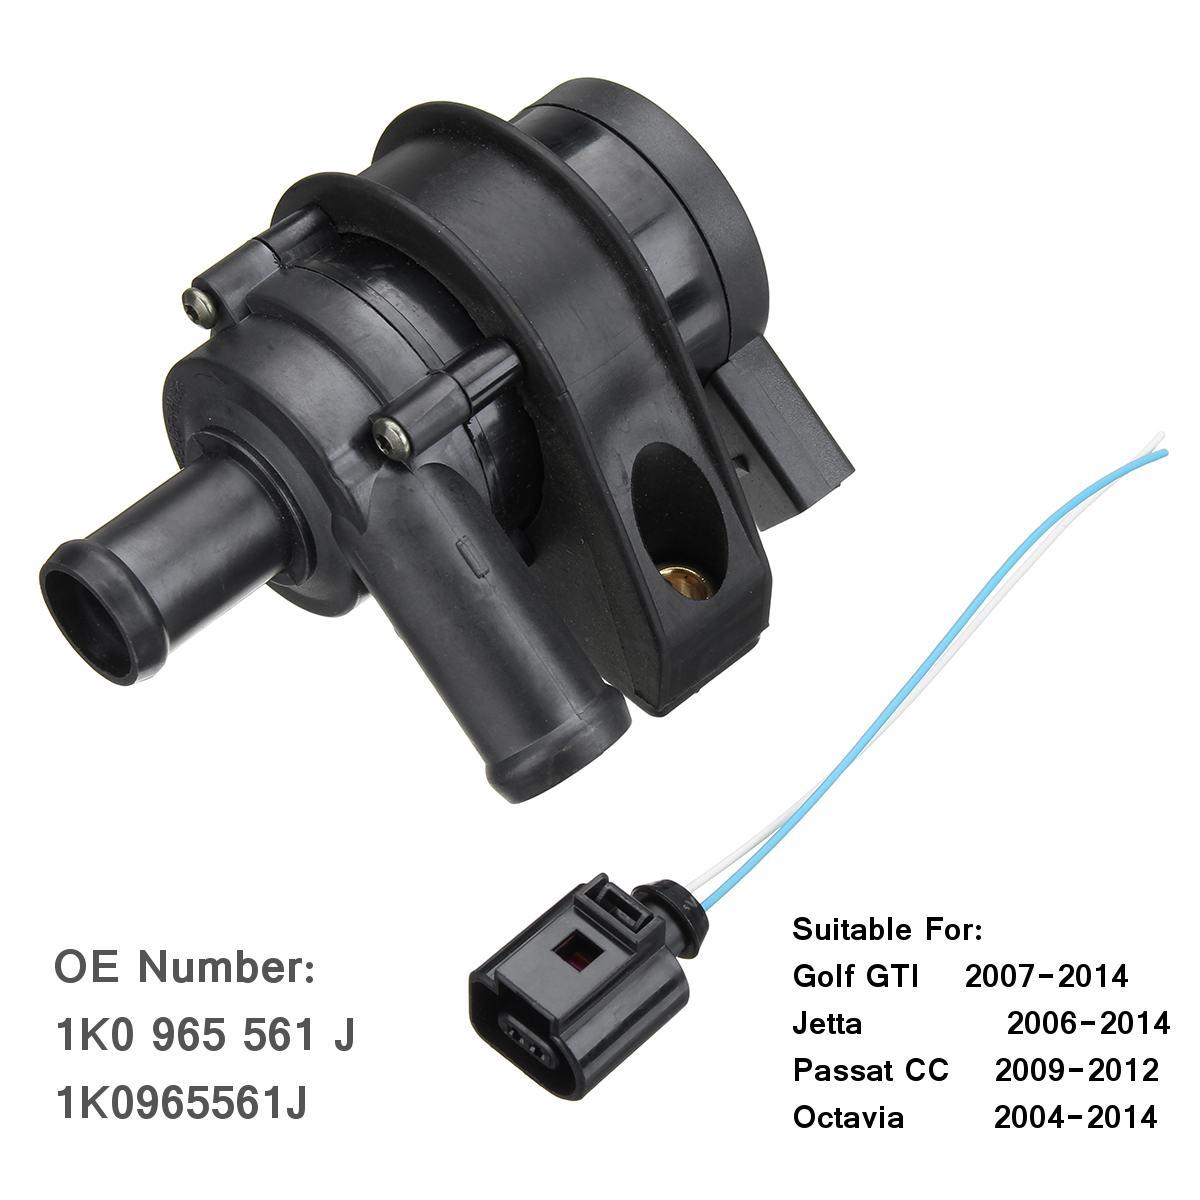 Cable de conexión de bomba de agua de refrigeración de motor de coche 1K0965561J 1K0965561G para VW Jetta Golf GTI Passat CC Octavia 1,8 T 2,0 T 12 V